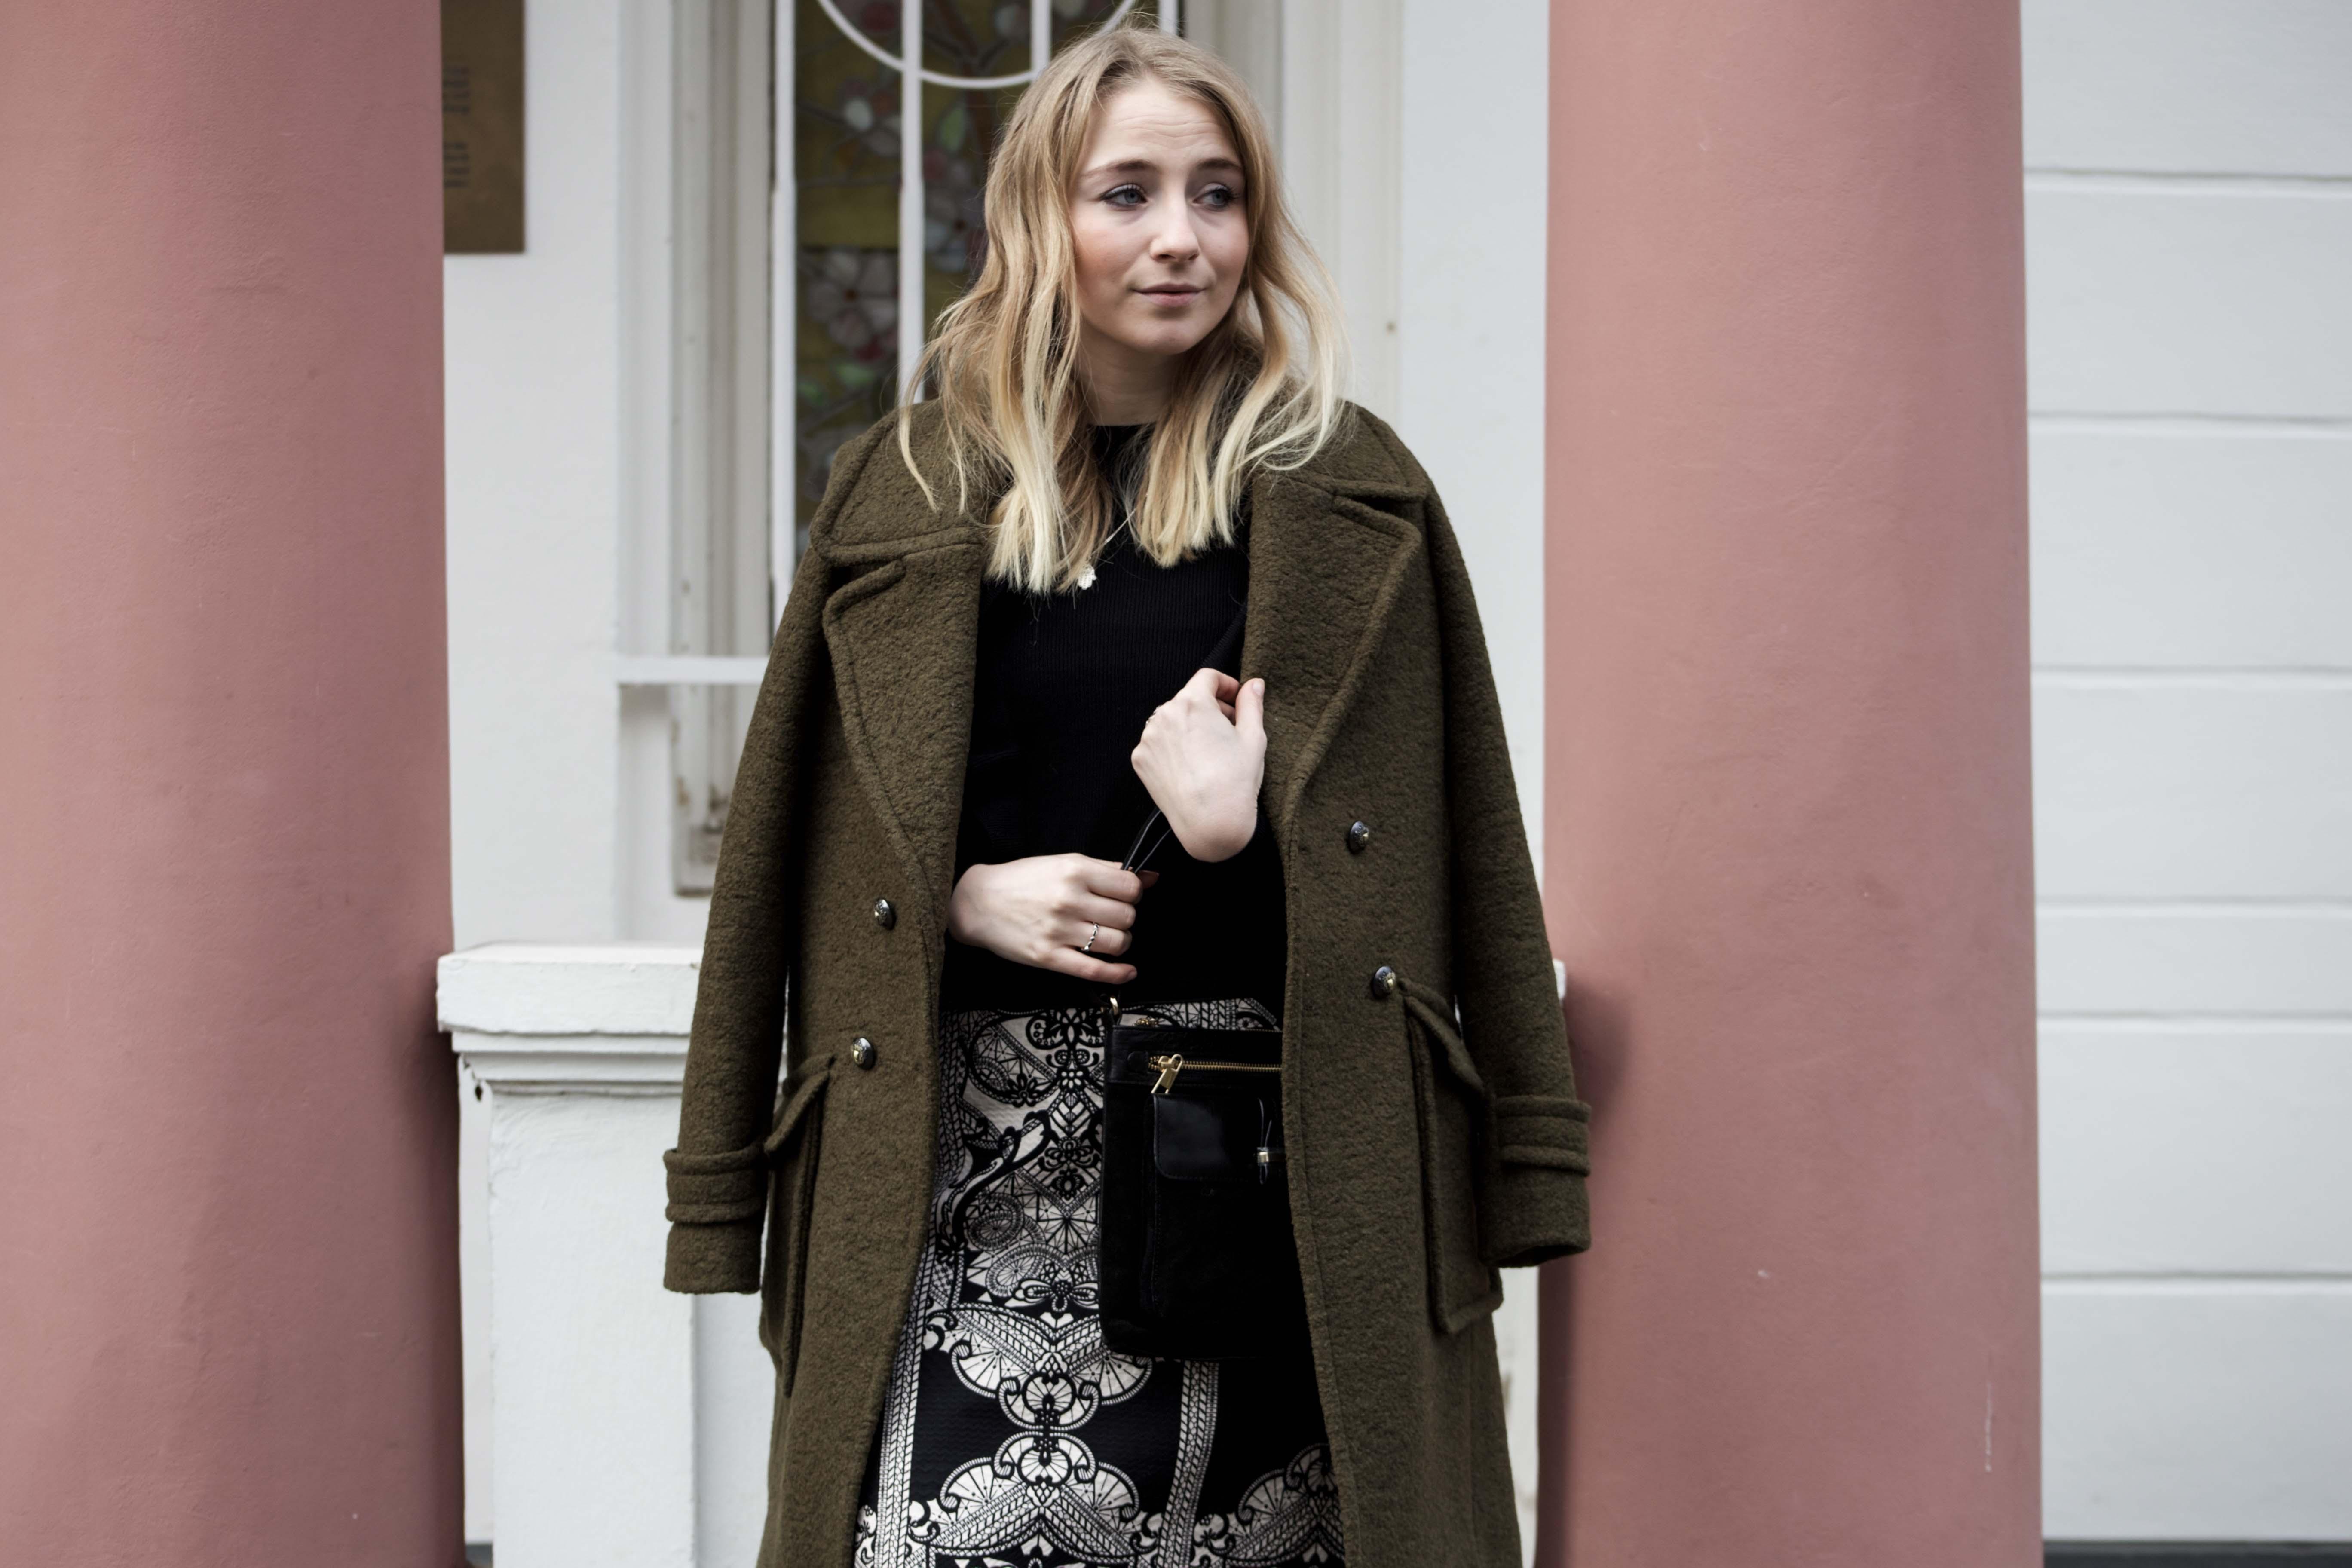 streetstyle-bonn-waldgrüner-mantel-rock-muster-print-fashionblogger-modeblog-mode-outfit_0116